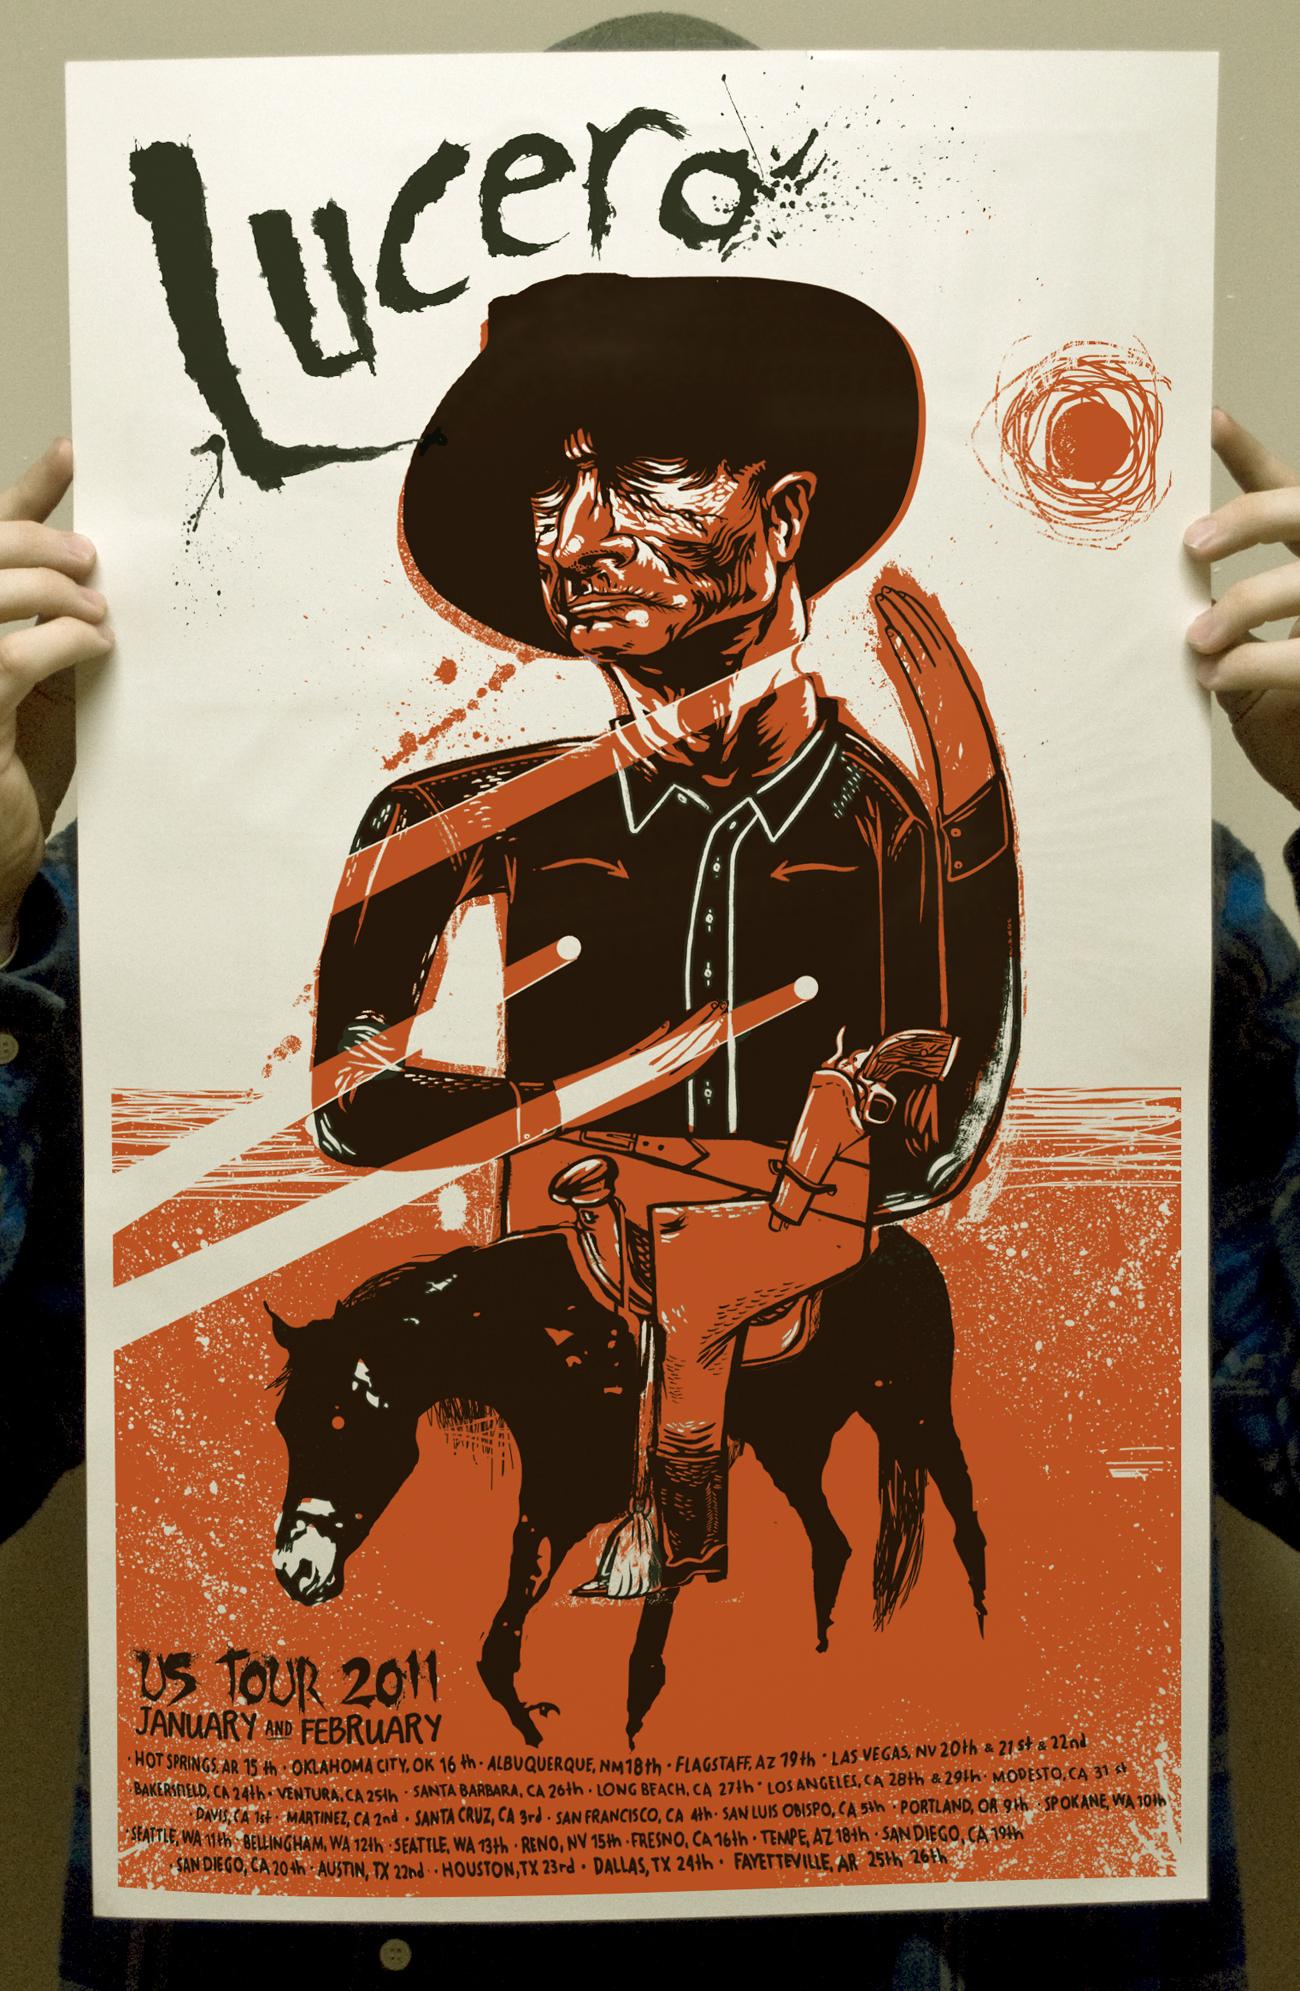 The Cowboy Lucero Tour poster 2011 on Storenvy